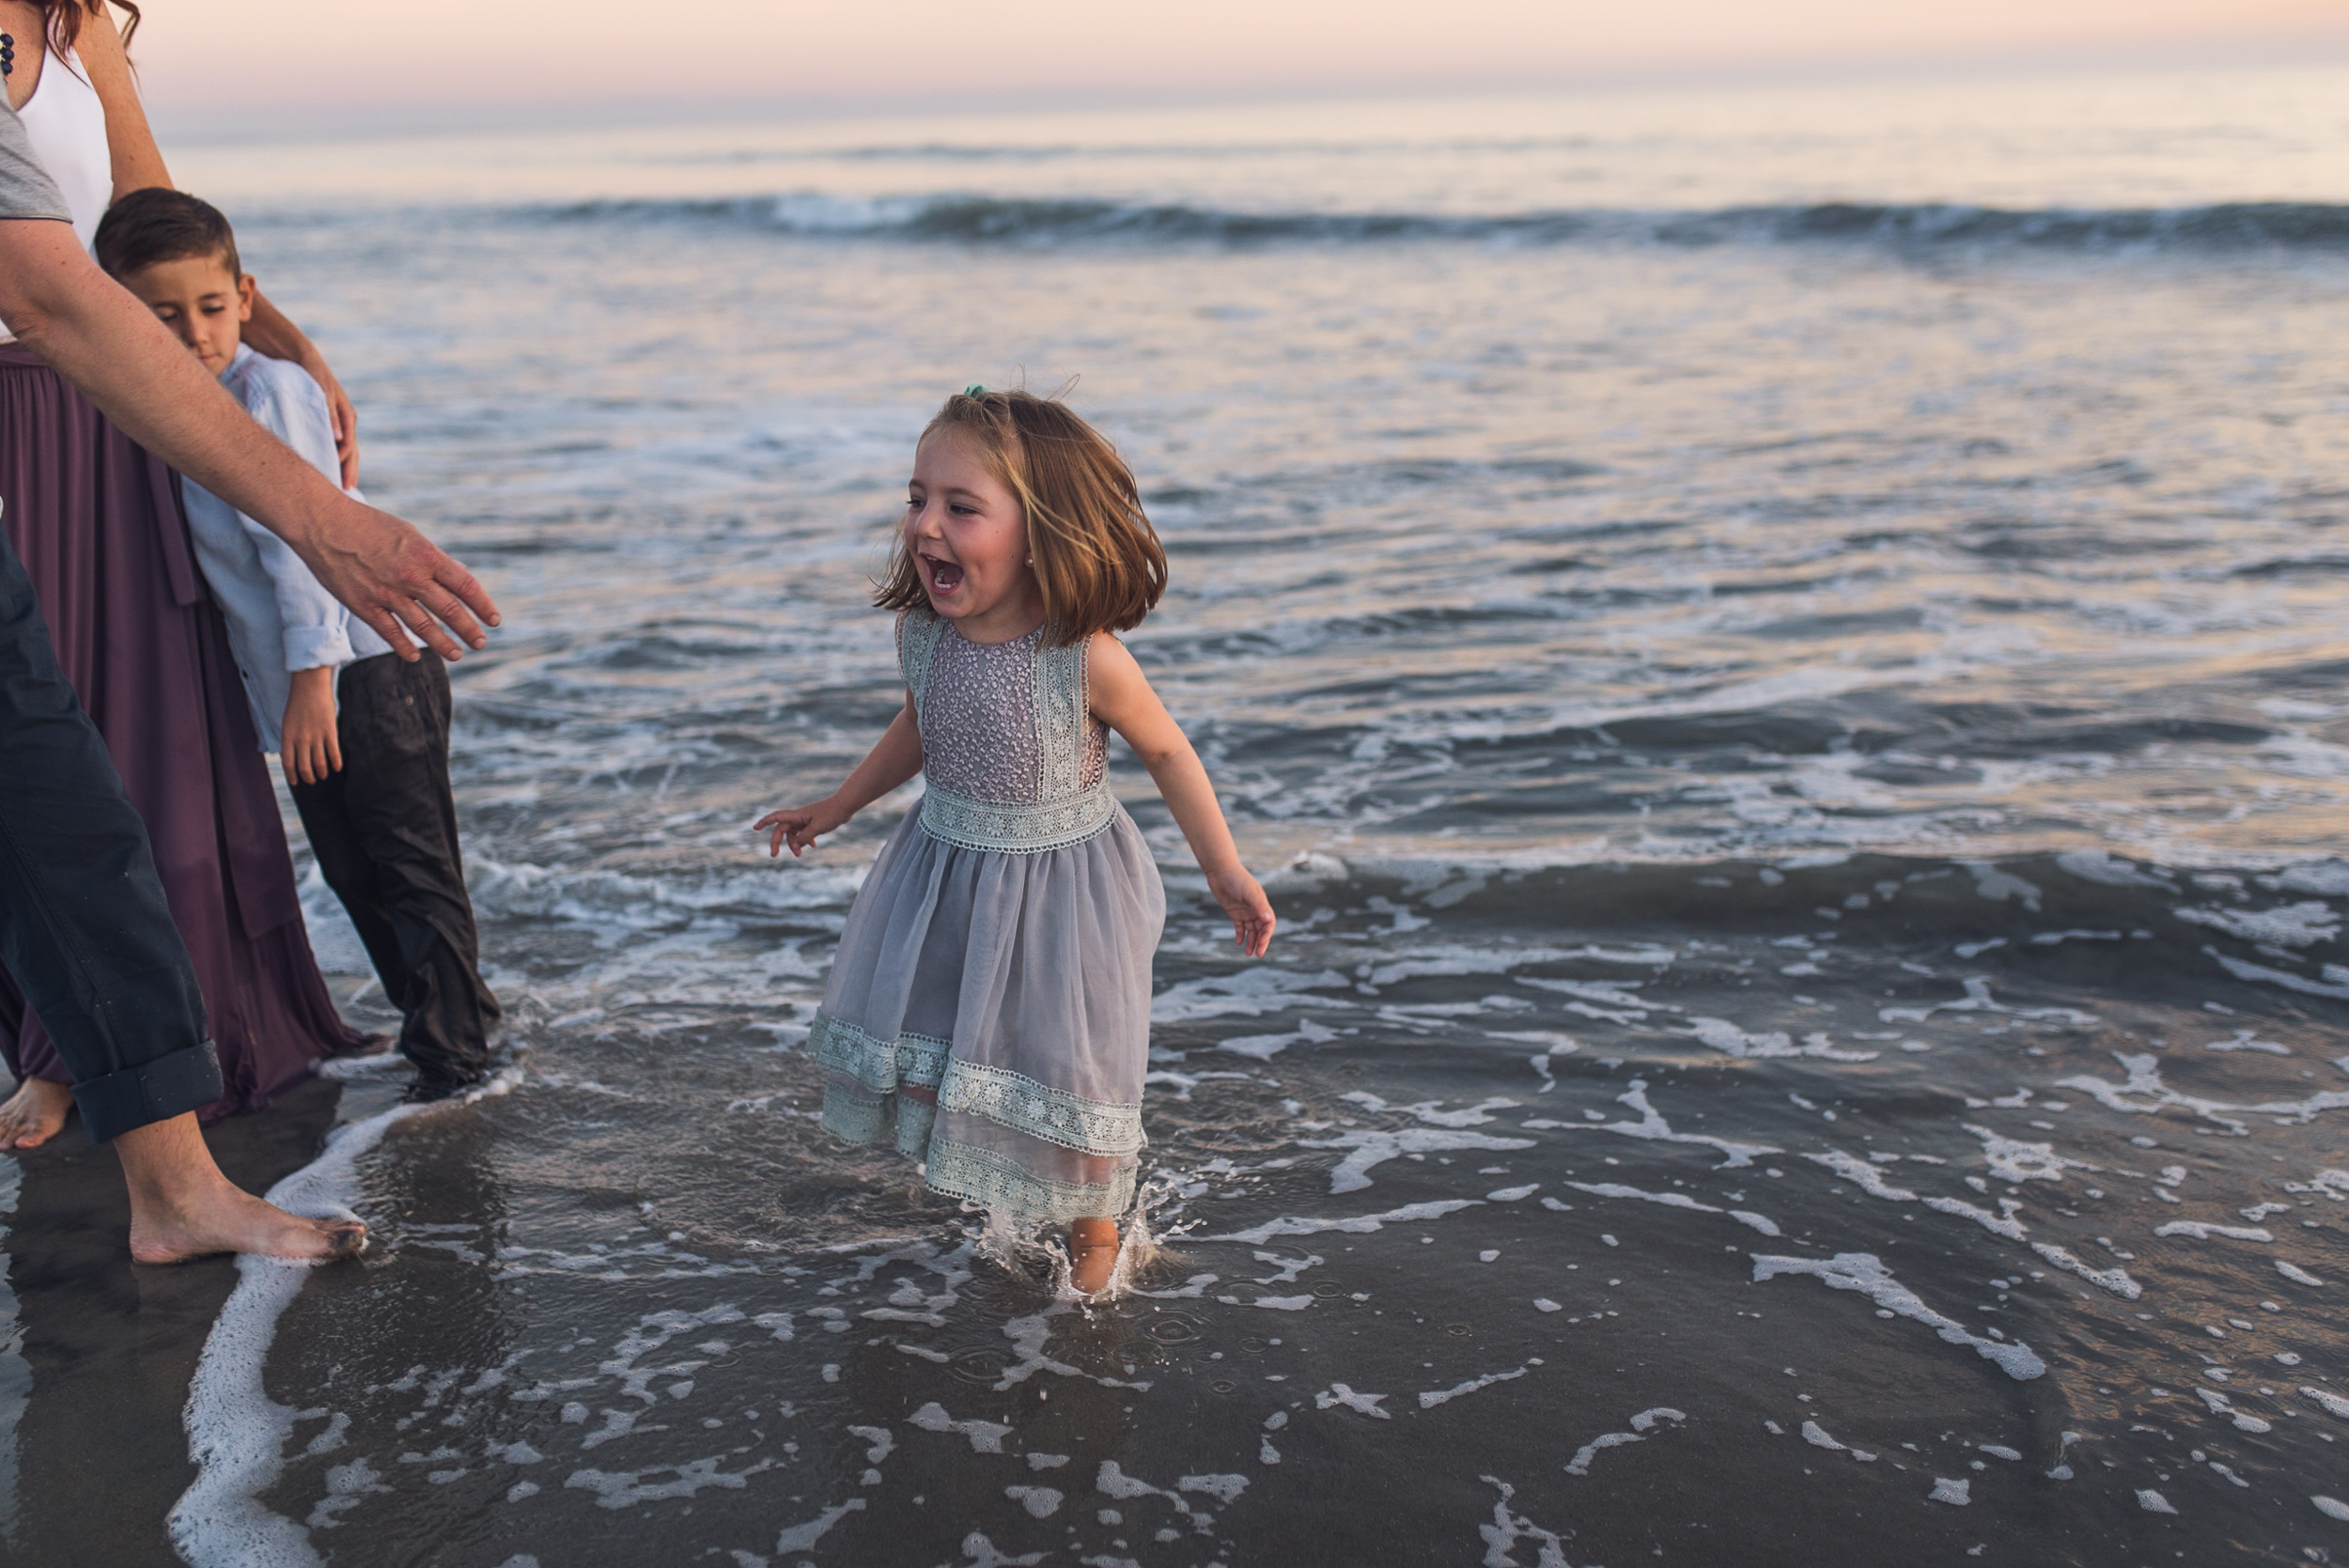 2018-San-Diego-Family-Lifestyle-Newborn-Travel-Vacation-Photographer-Kelsey-Smith-Photography-Coronado-La-Jolla-Encinitas-Solana-Beach-Del-Mar-207.jpg